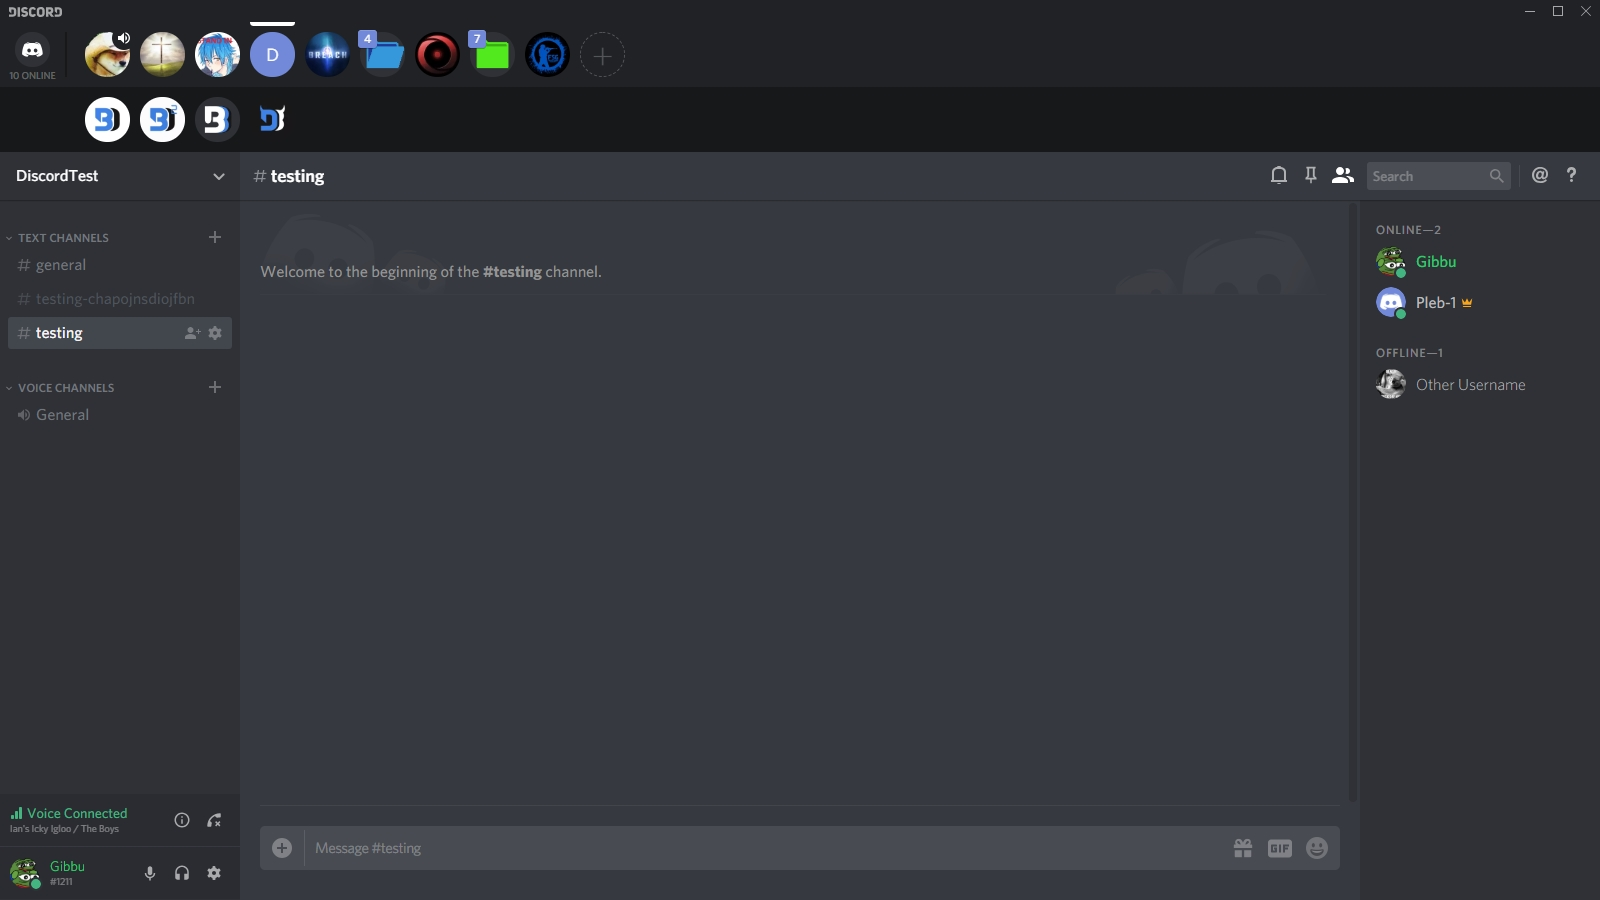 BetterDiscord-Themes/HorizontalServerlist at master · Gibbu